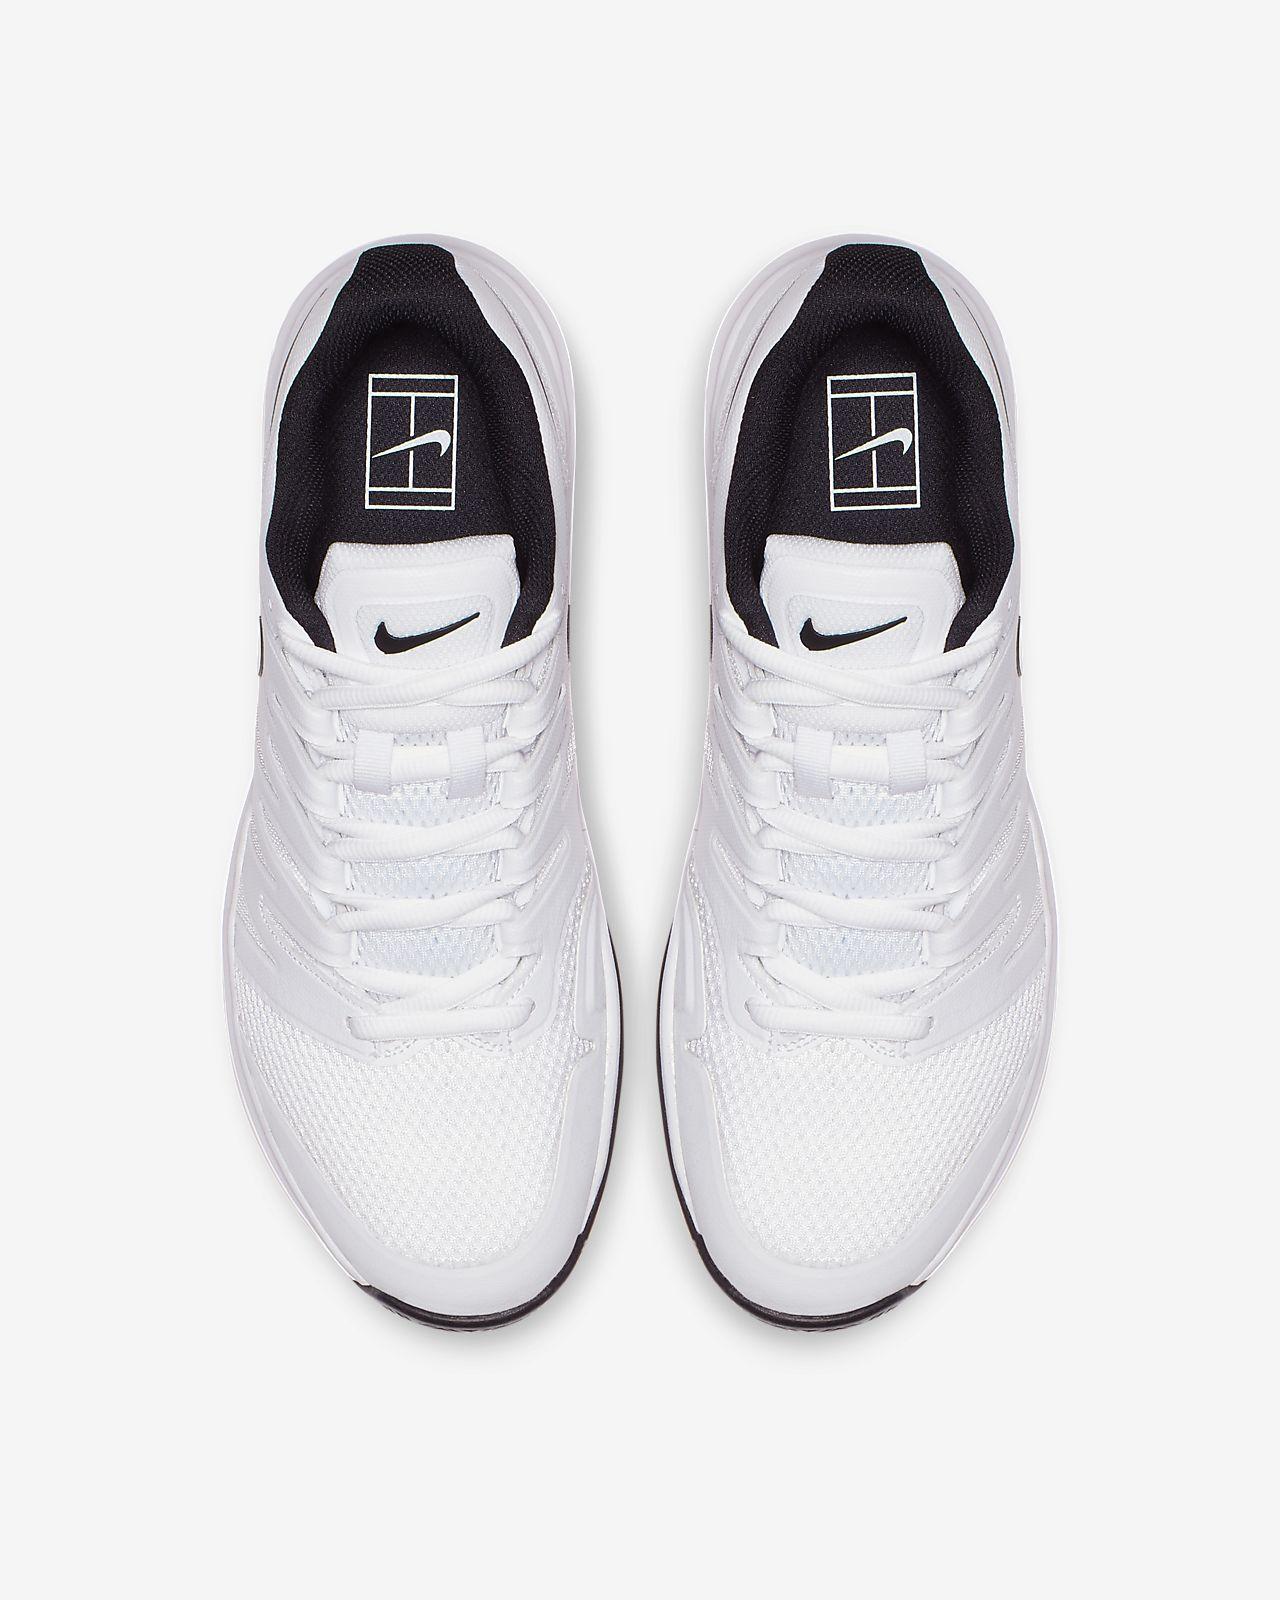 5c45a6fd7474f NikeCourt Air Zoom Prestige Men's Hard Court Tennis Shoe